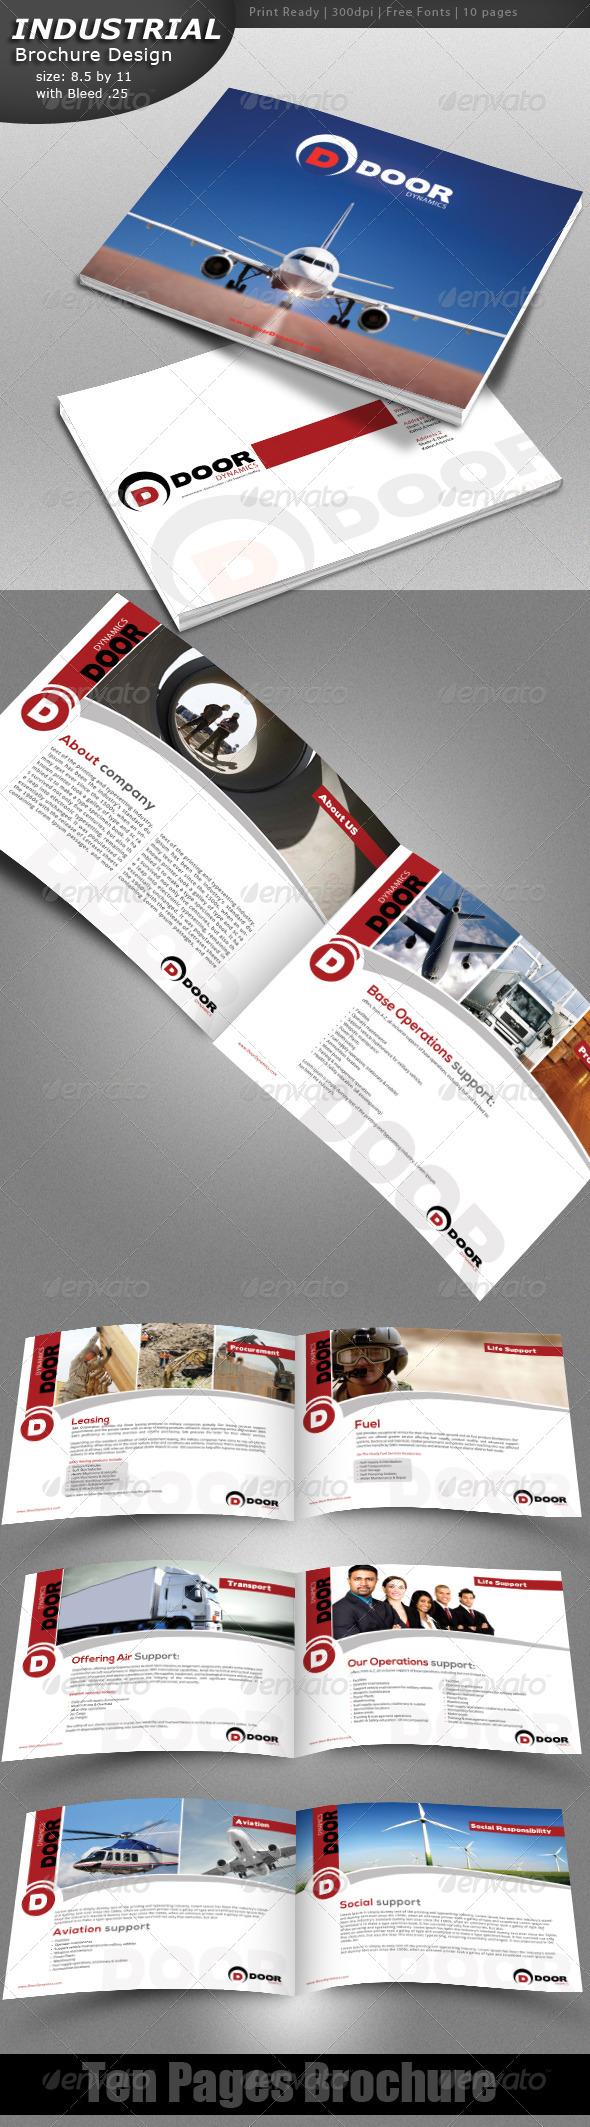 Indestrial Brochure - Brochures Print Templates